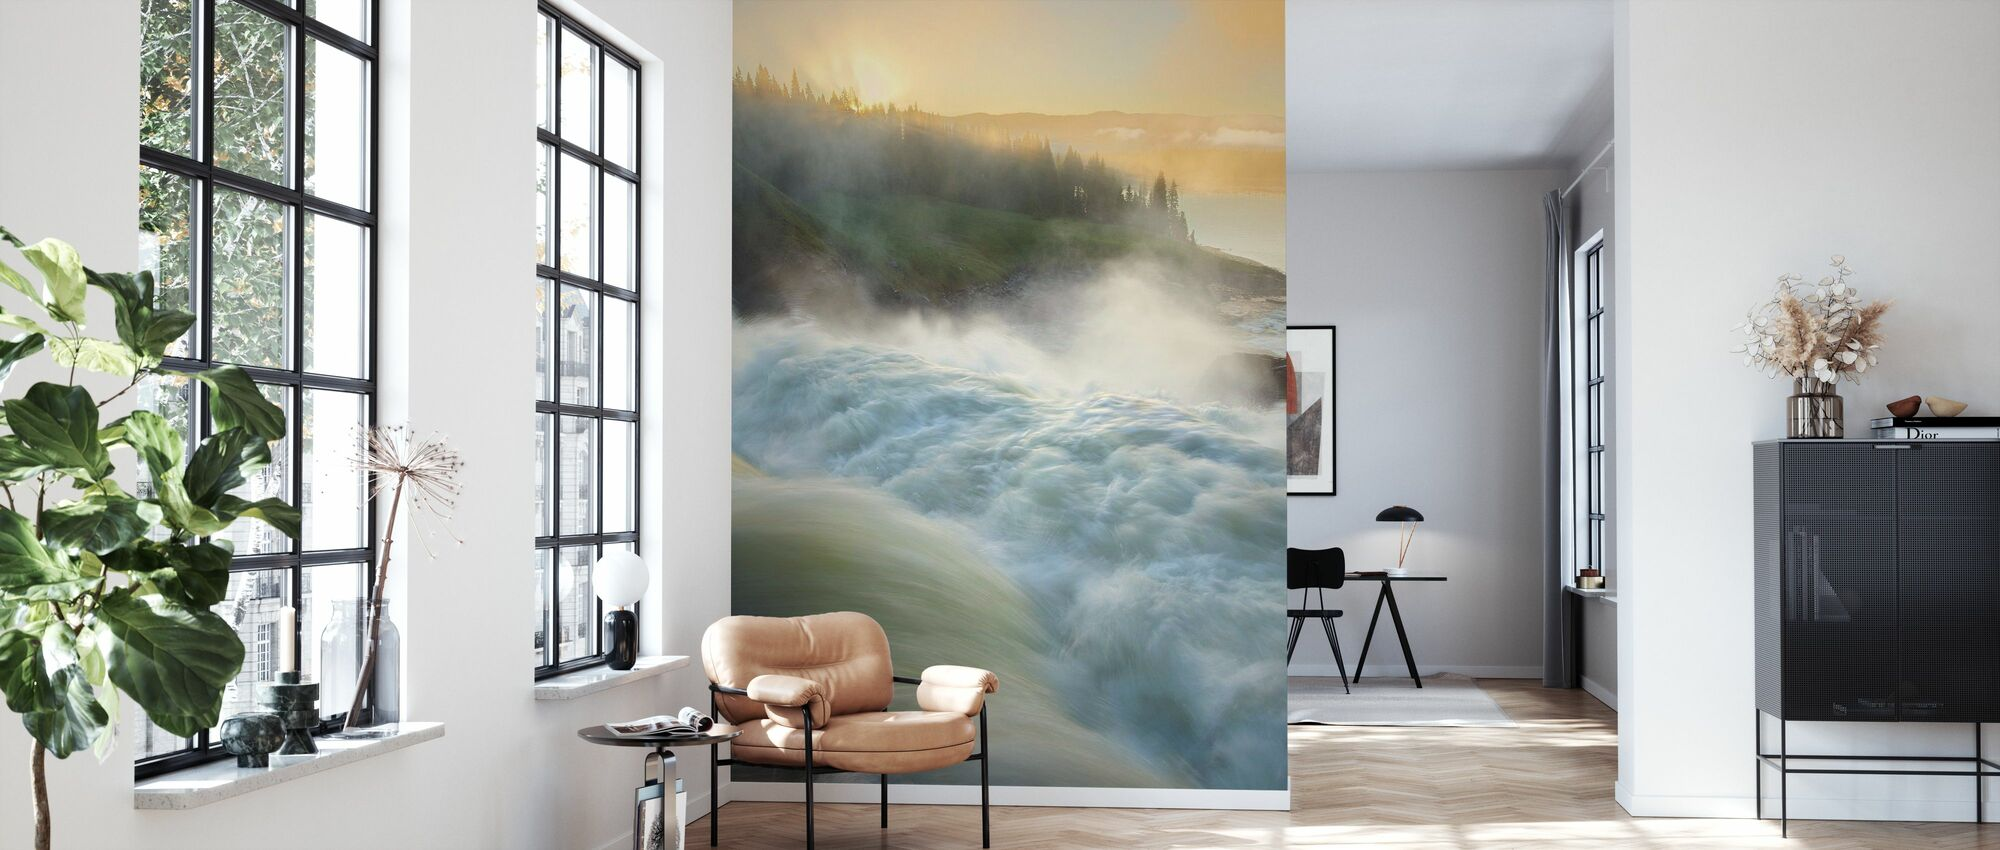 Jämtland River, Sweden - Wallpaper - Living Room